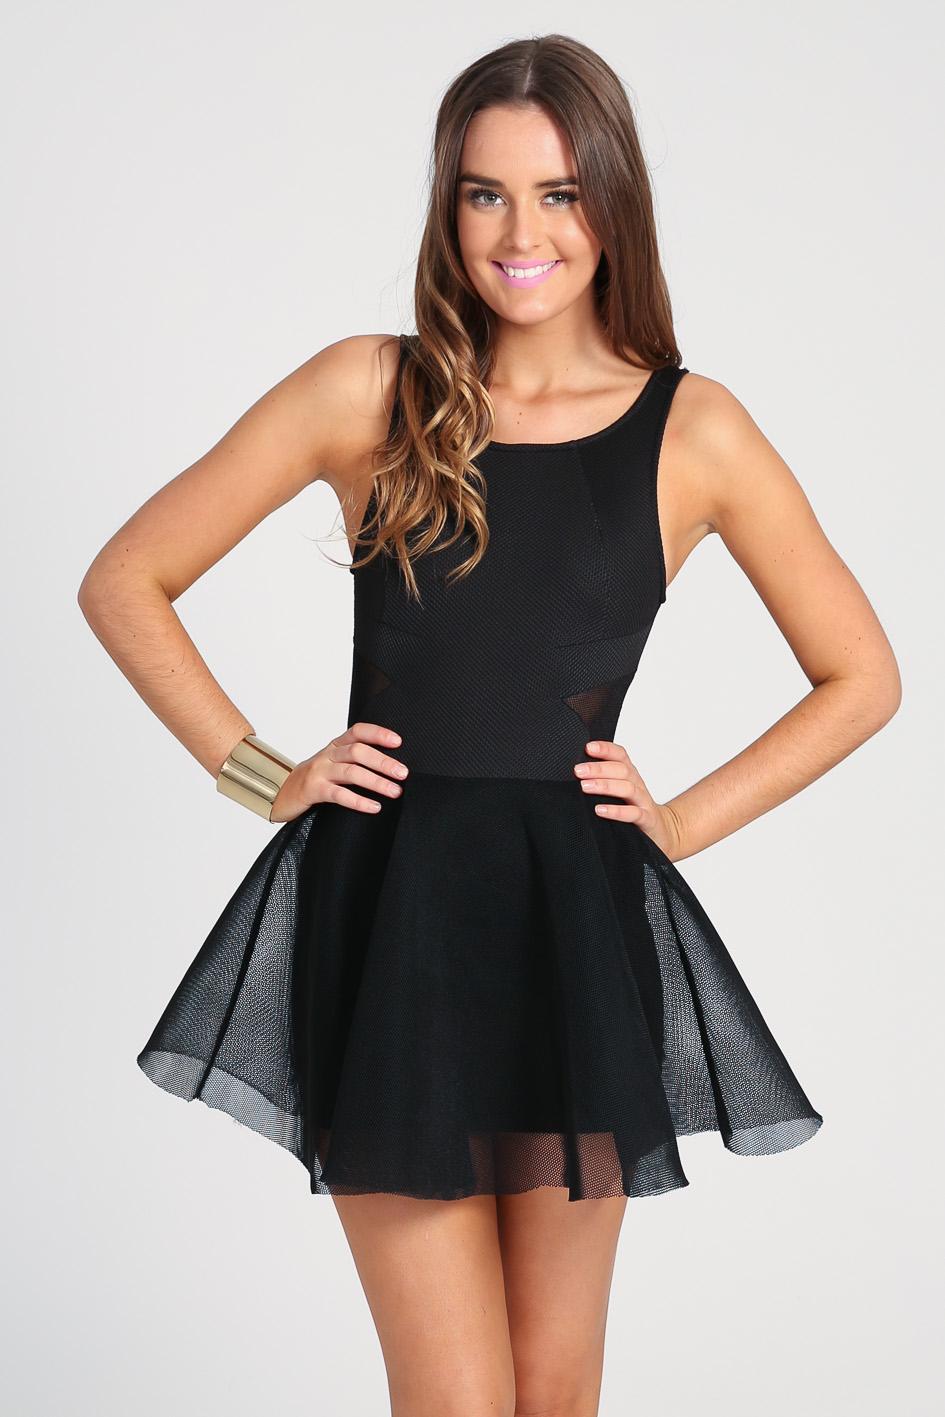 Black Little Black Dress - Black Mesh Party Dress | UsTrendy